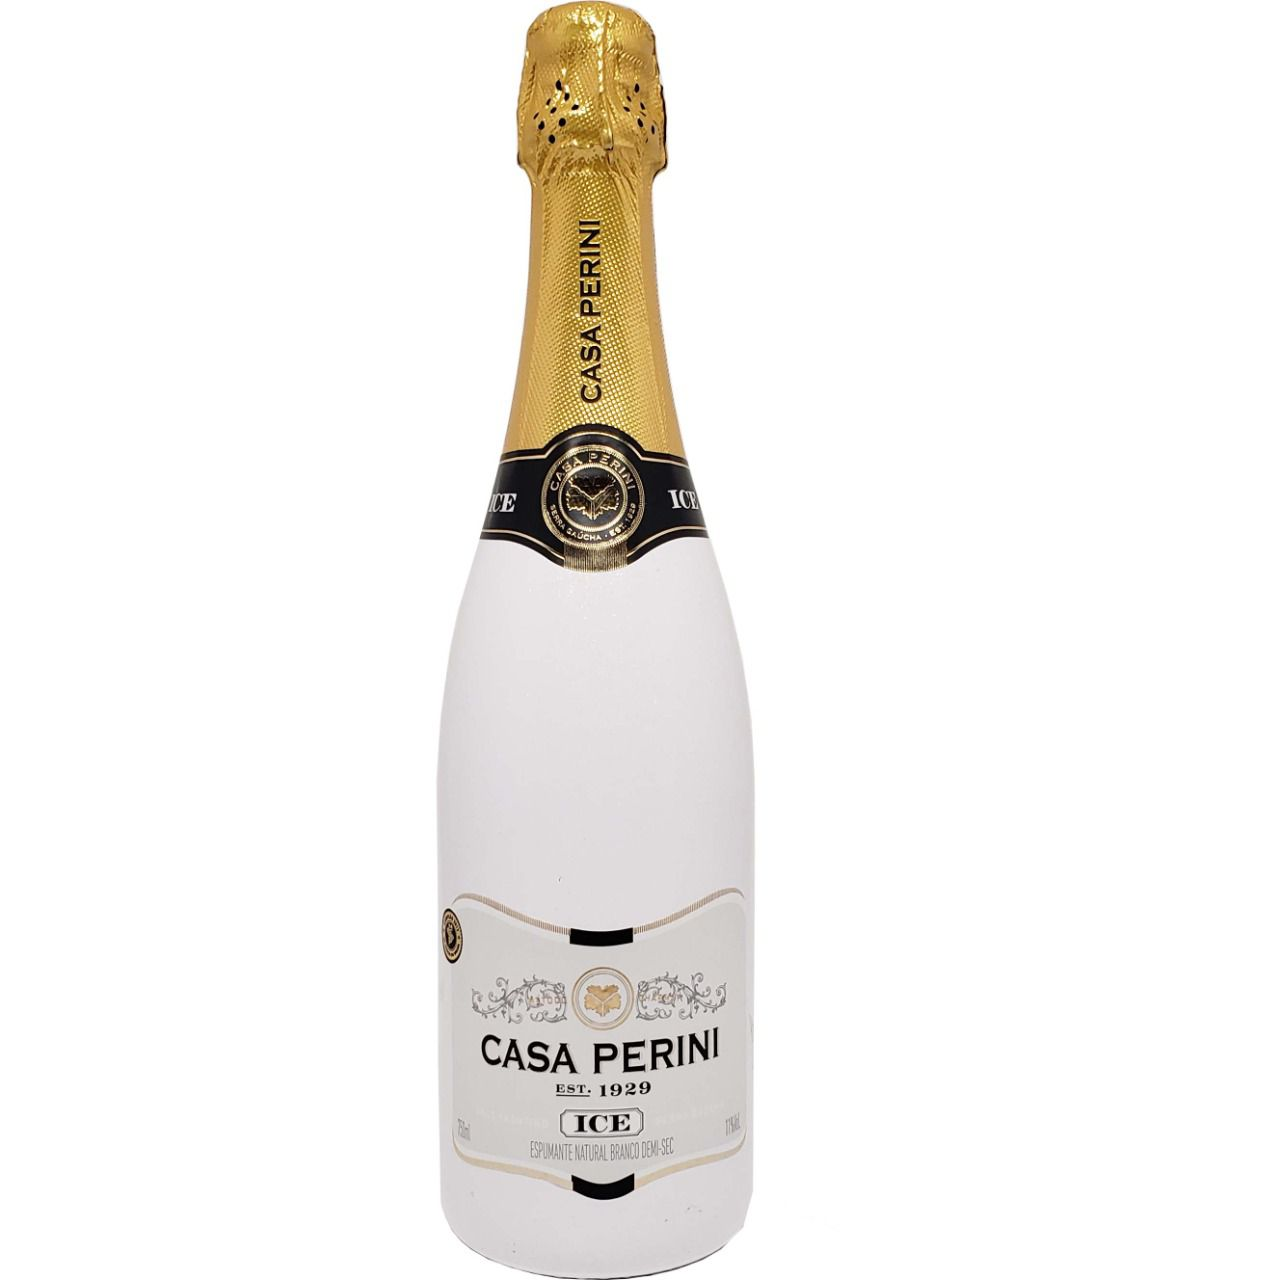 Vinho Espumante Branco Casa Perini  ICE Demi-Sec - 750ml -